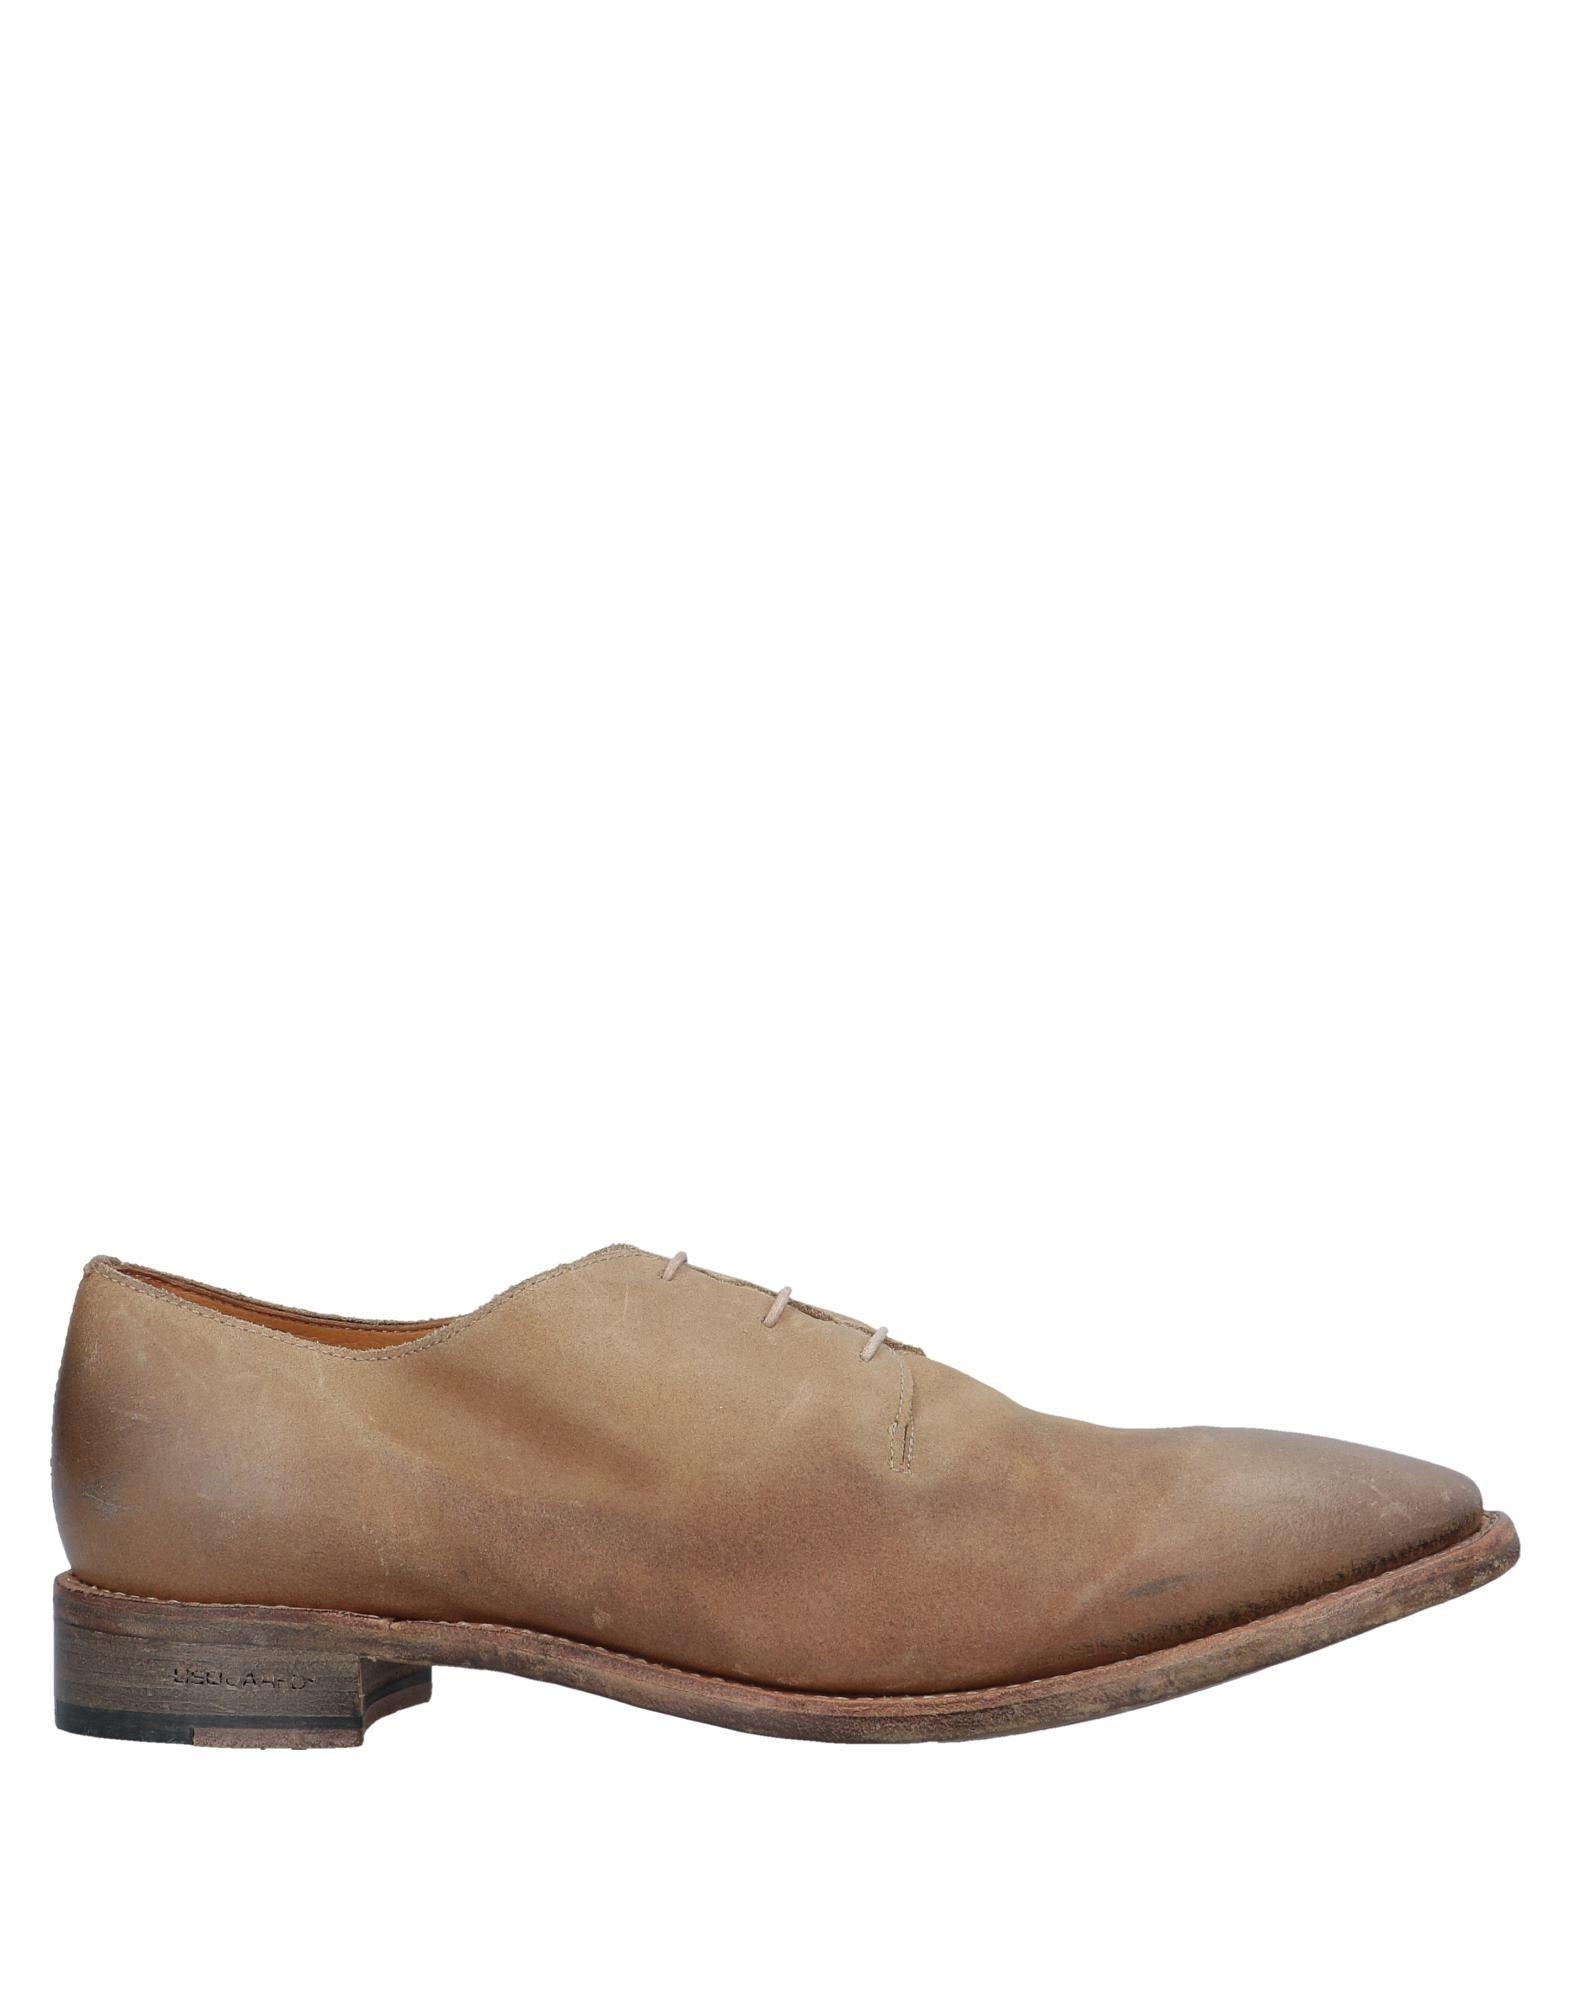 DSQUARED2 Обувь на шнурках цены онлайн